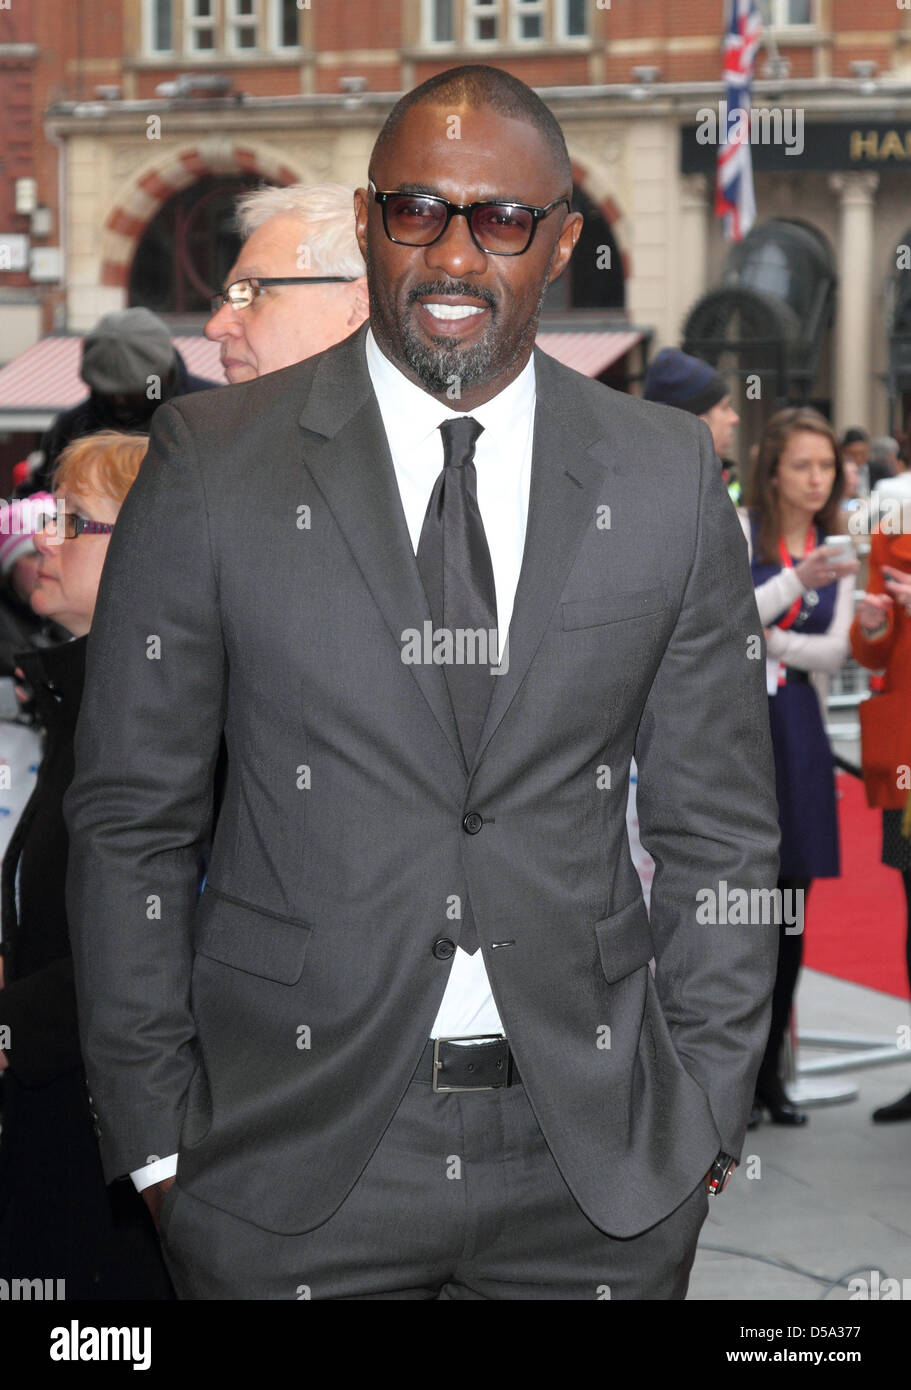 Idris Elba The Wire Stock Photos & Idris Elba The Wire Stock Images ...